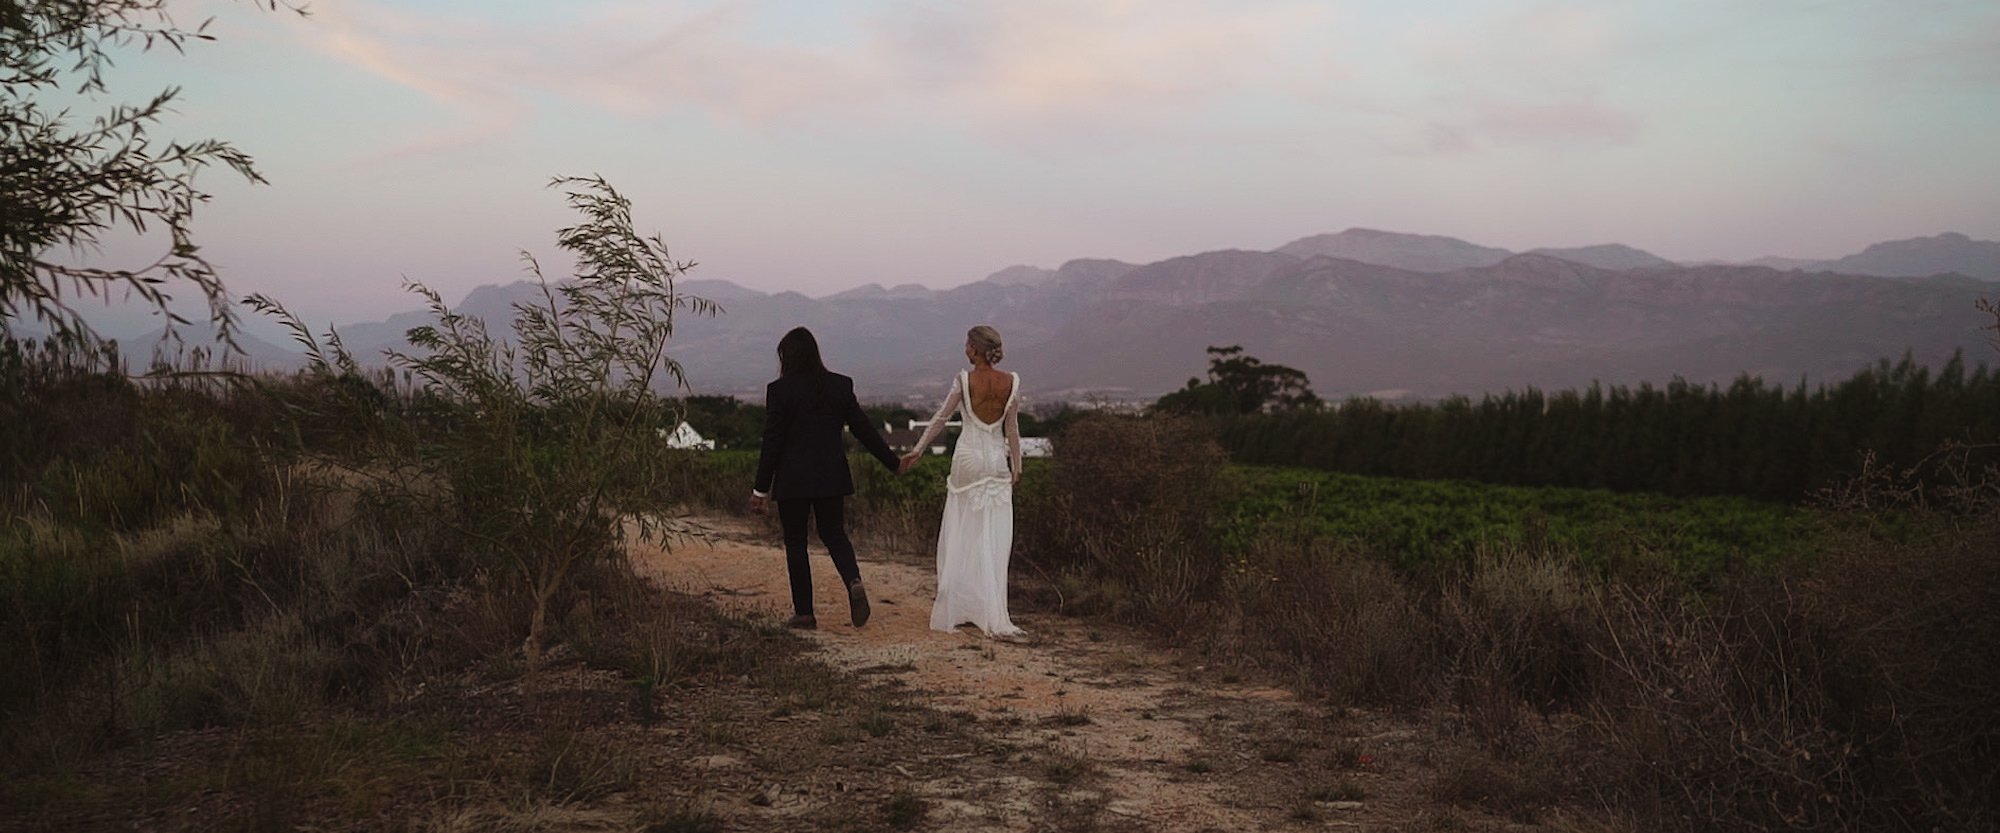 HeathEmelieWeddingFilm_Babylonstoren_Wedding_16.jpg